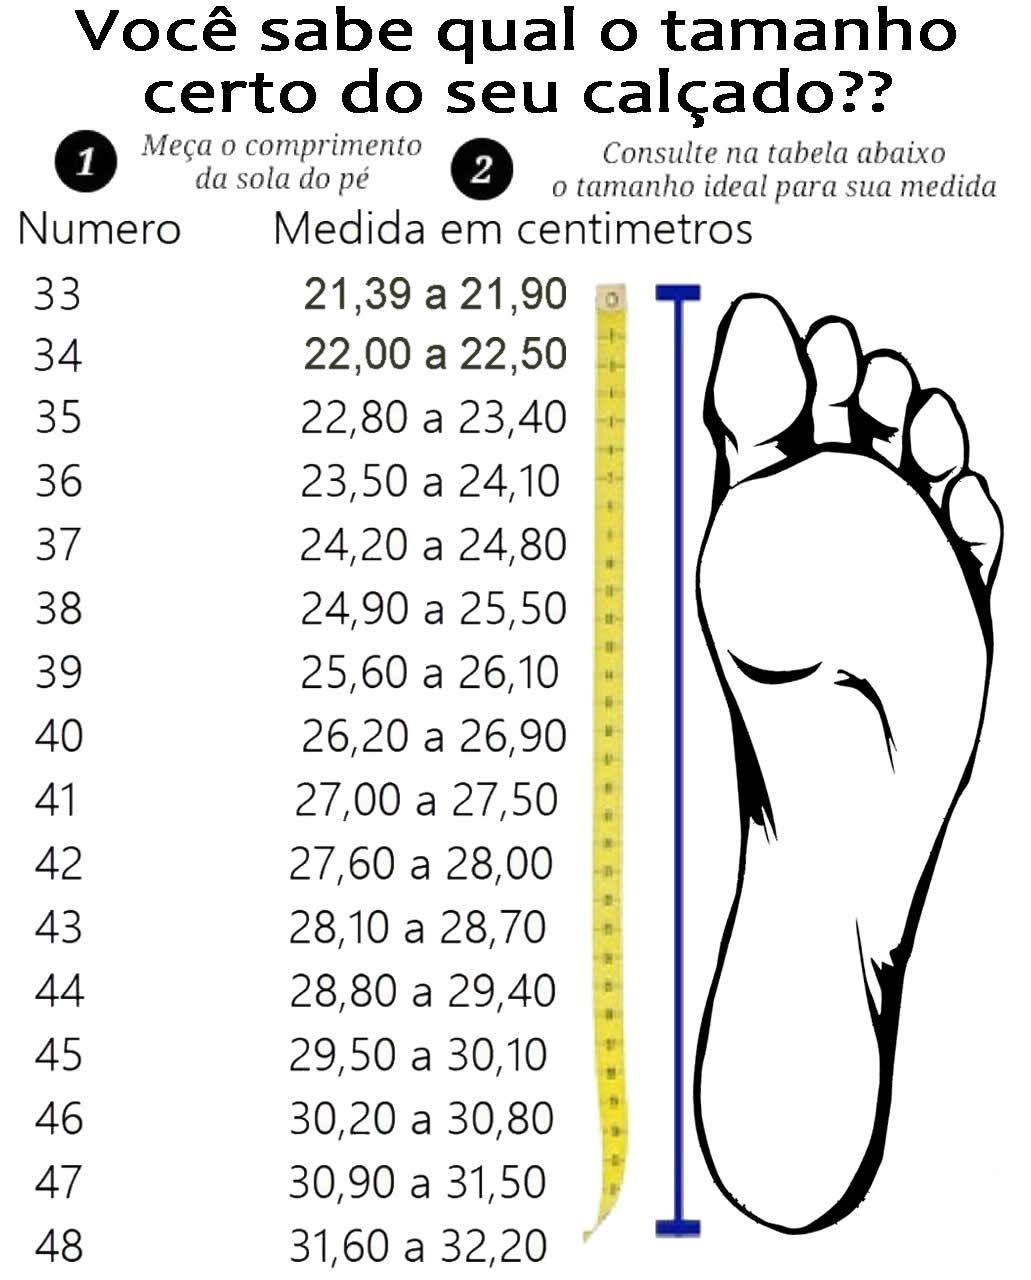 SANDÁLIA VIA UNO MEIA PATA TIRA LAÇO - 336007